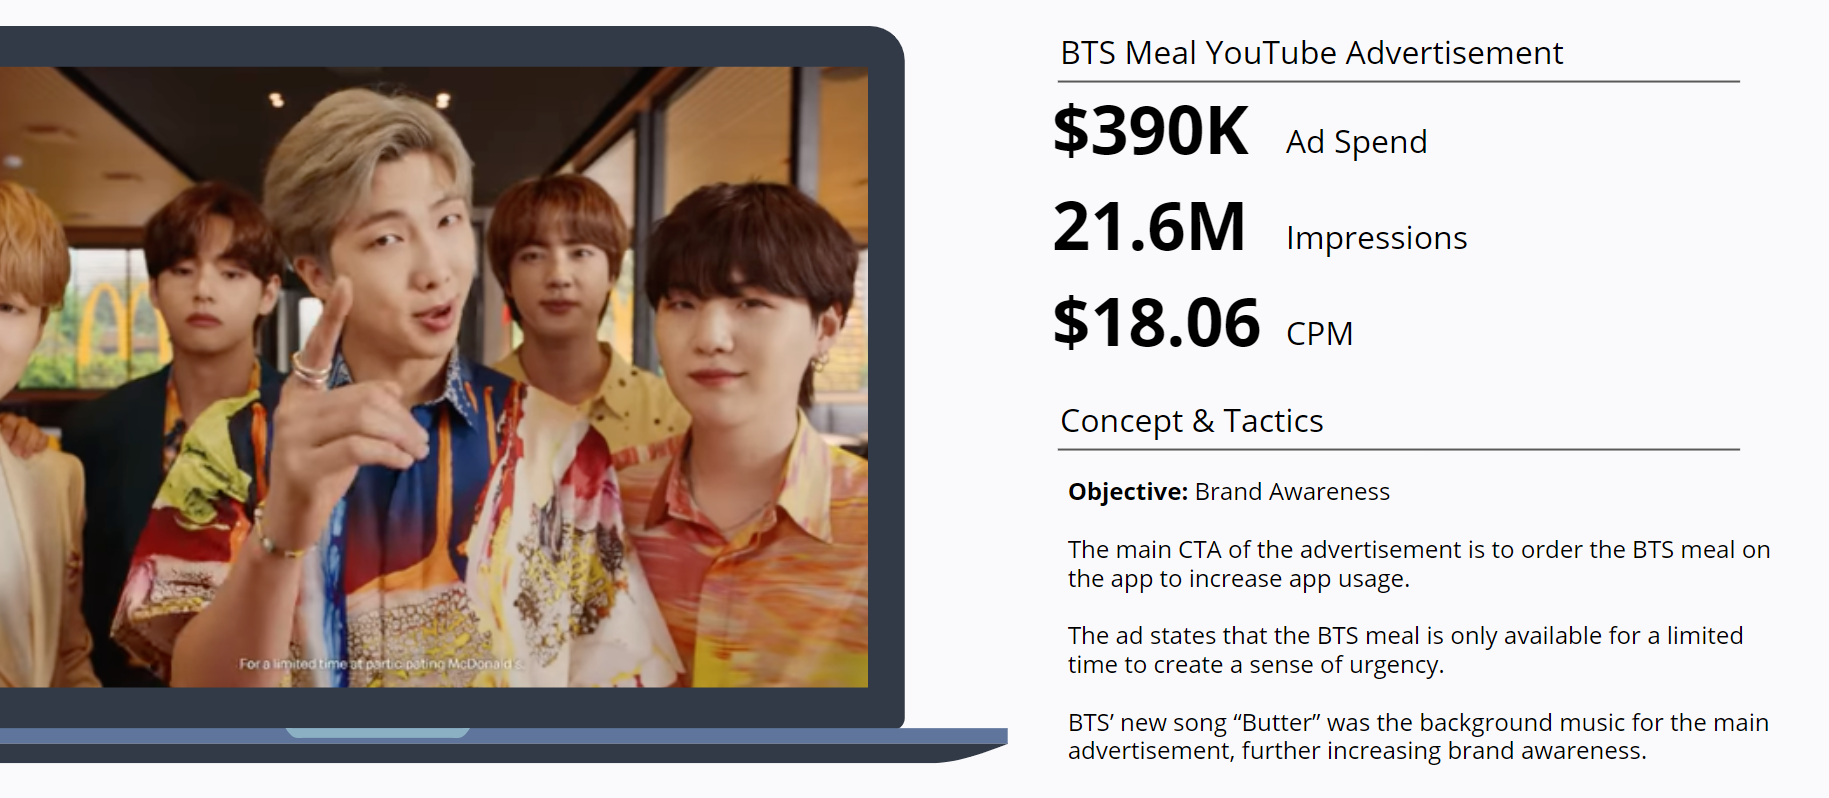 BTS - McDonalds - BTS Meal YouTube Advertisement